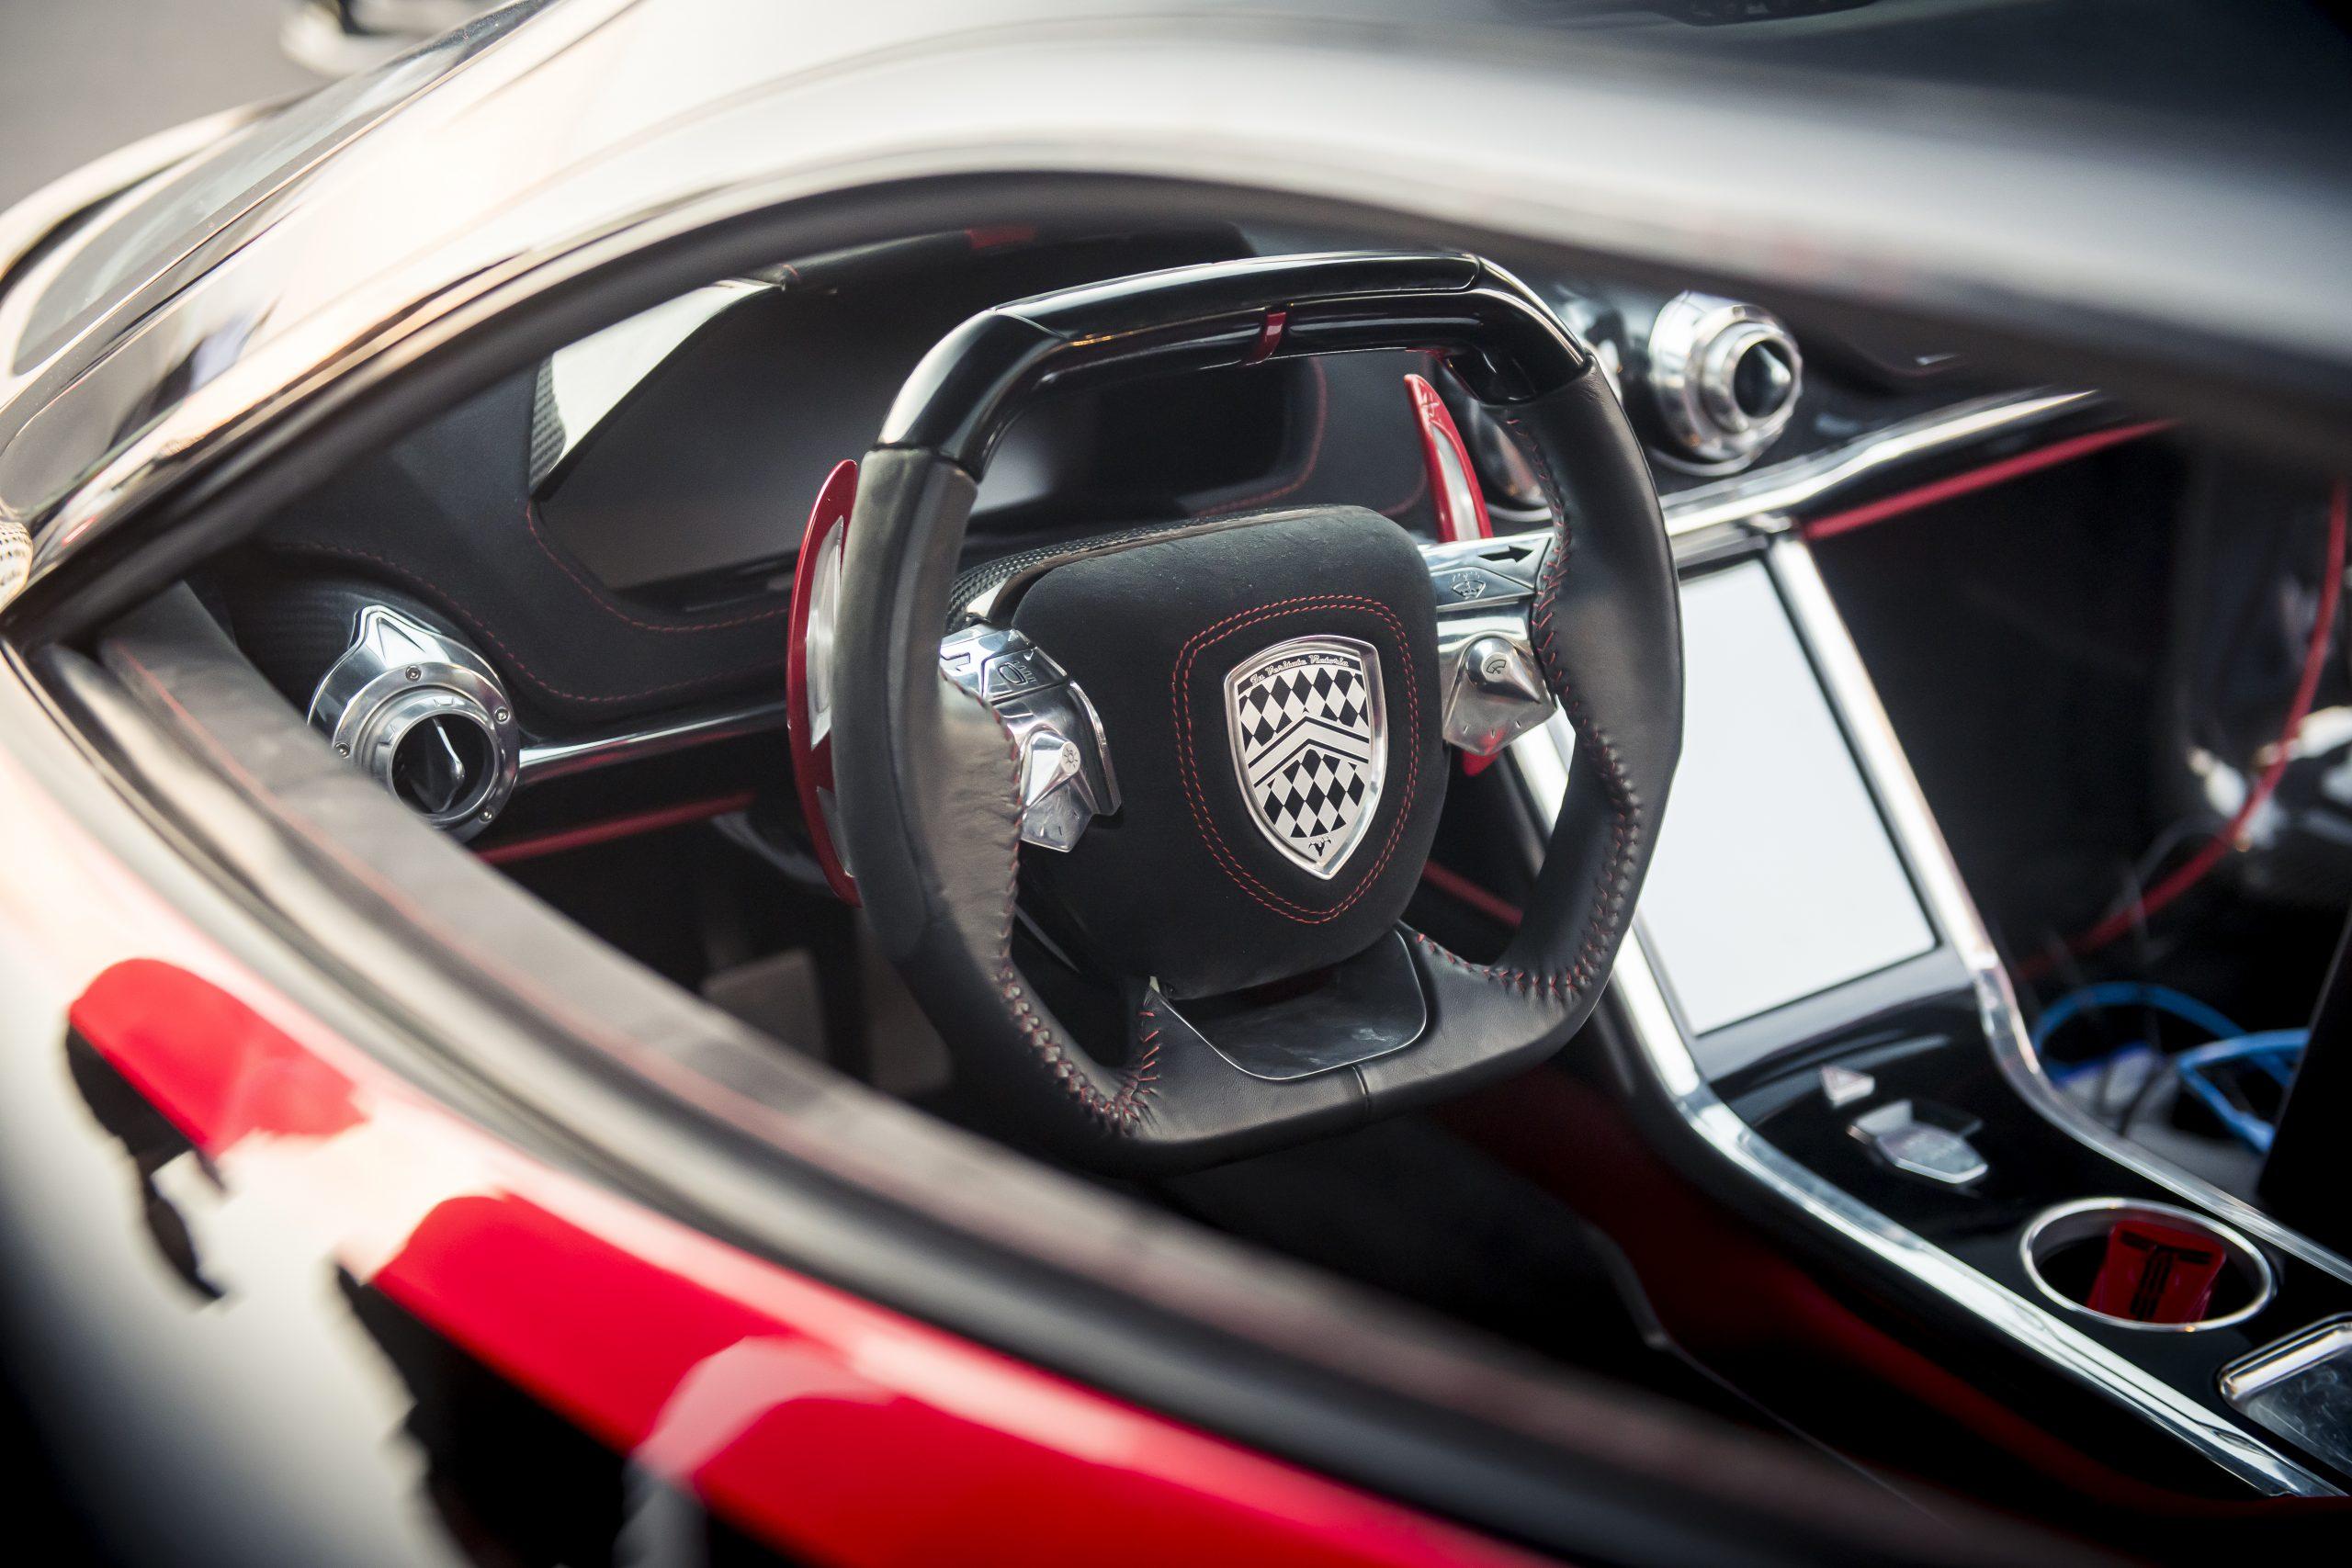 SSC Tuatara Production Car Speed Record steering wheel